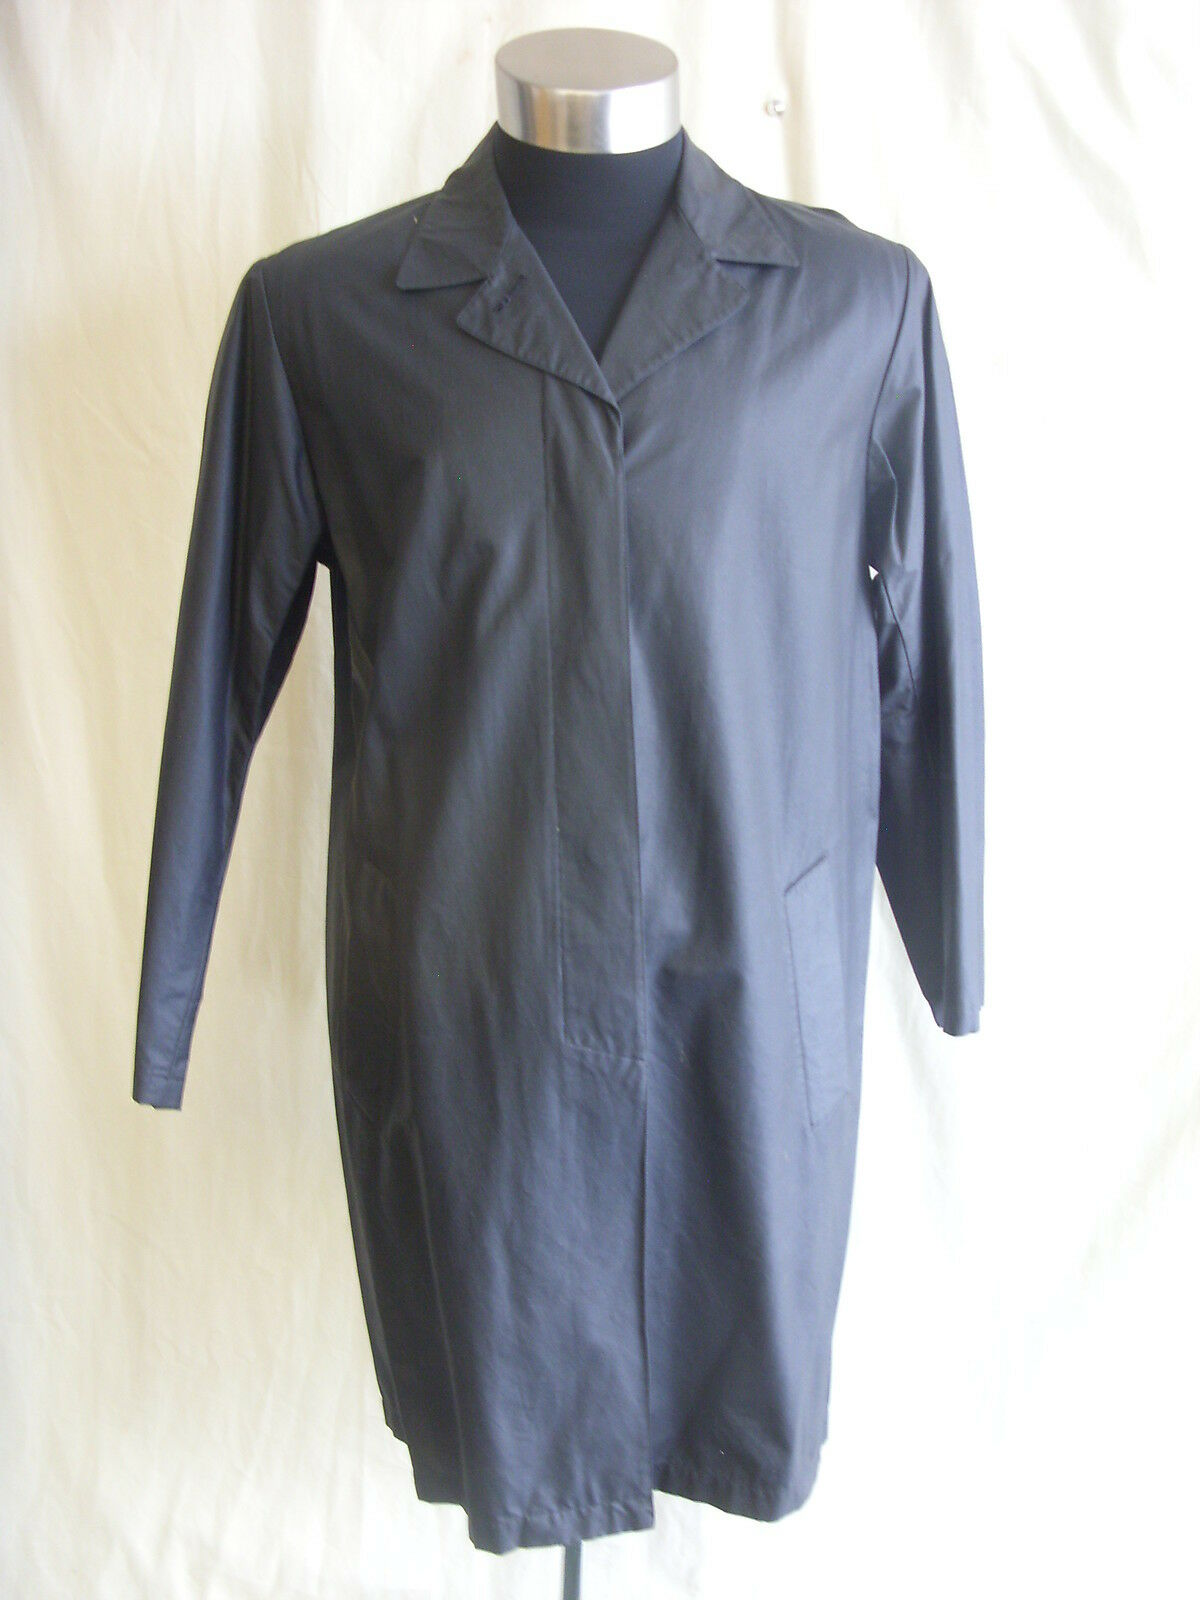 Mens Coat - London Fog, size 42  regular, navy dark bluee, mac raincoat - 2110